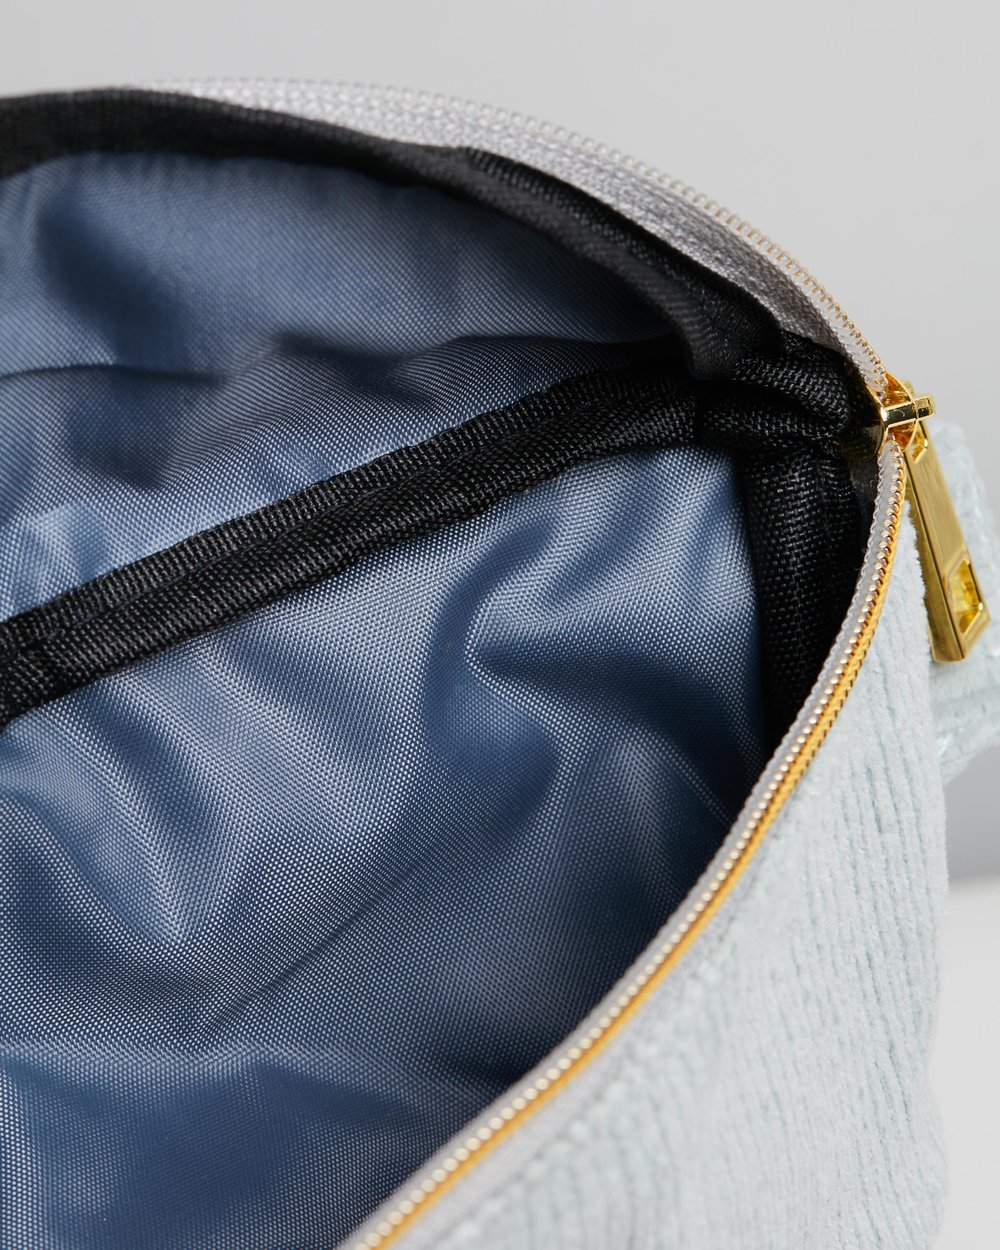 8ecfef35334f7 Corduroy Bum Bag by Mi-Pac Online